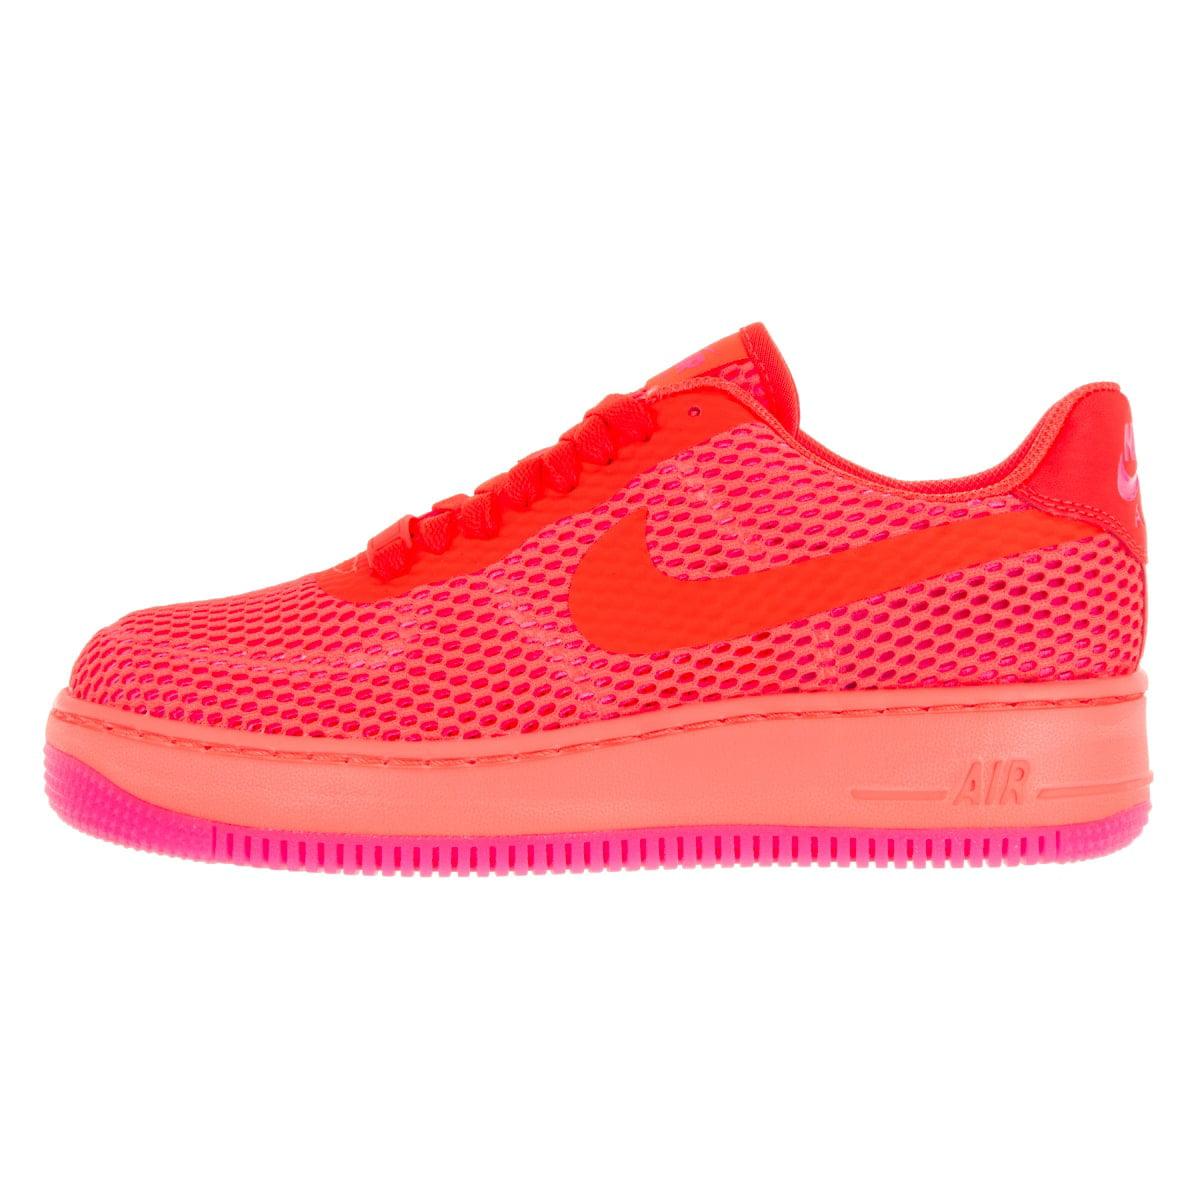 nike womens af1 low upstep br total crimson/total crimson casual shoe 9 women us